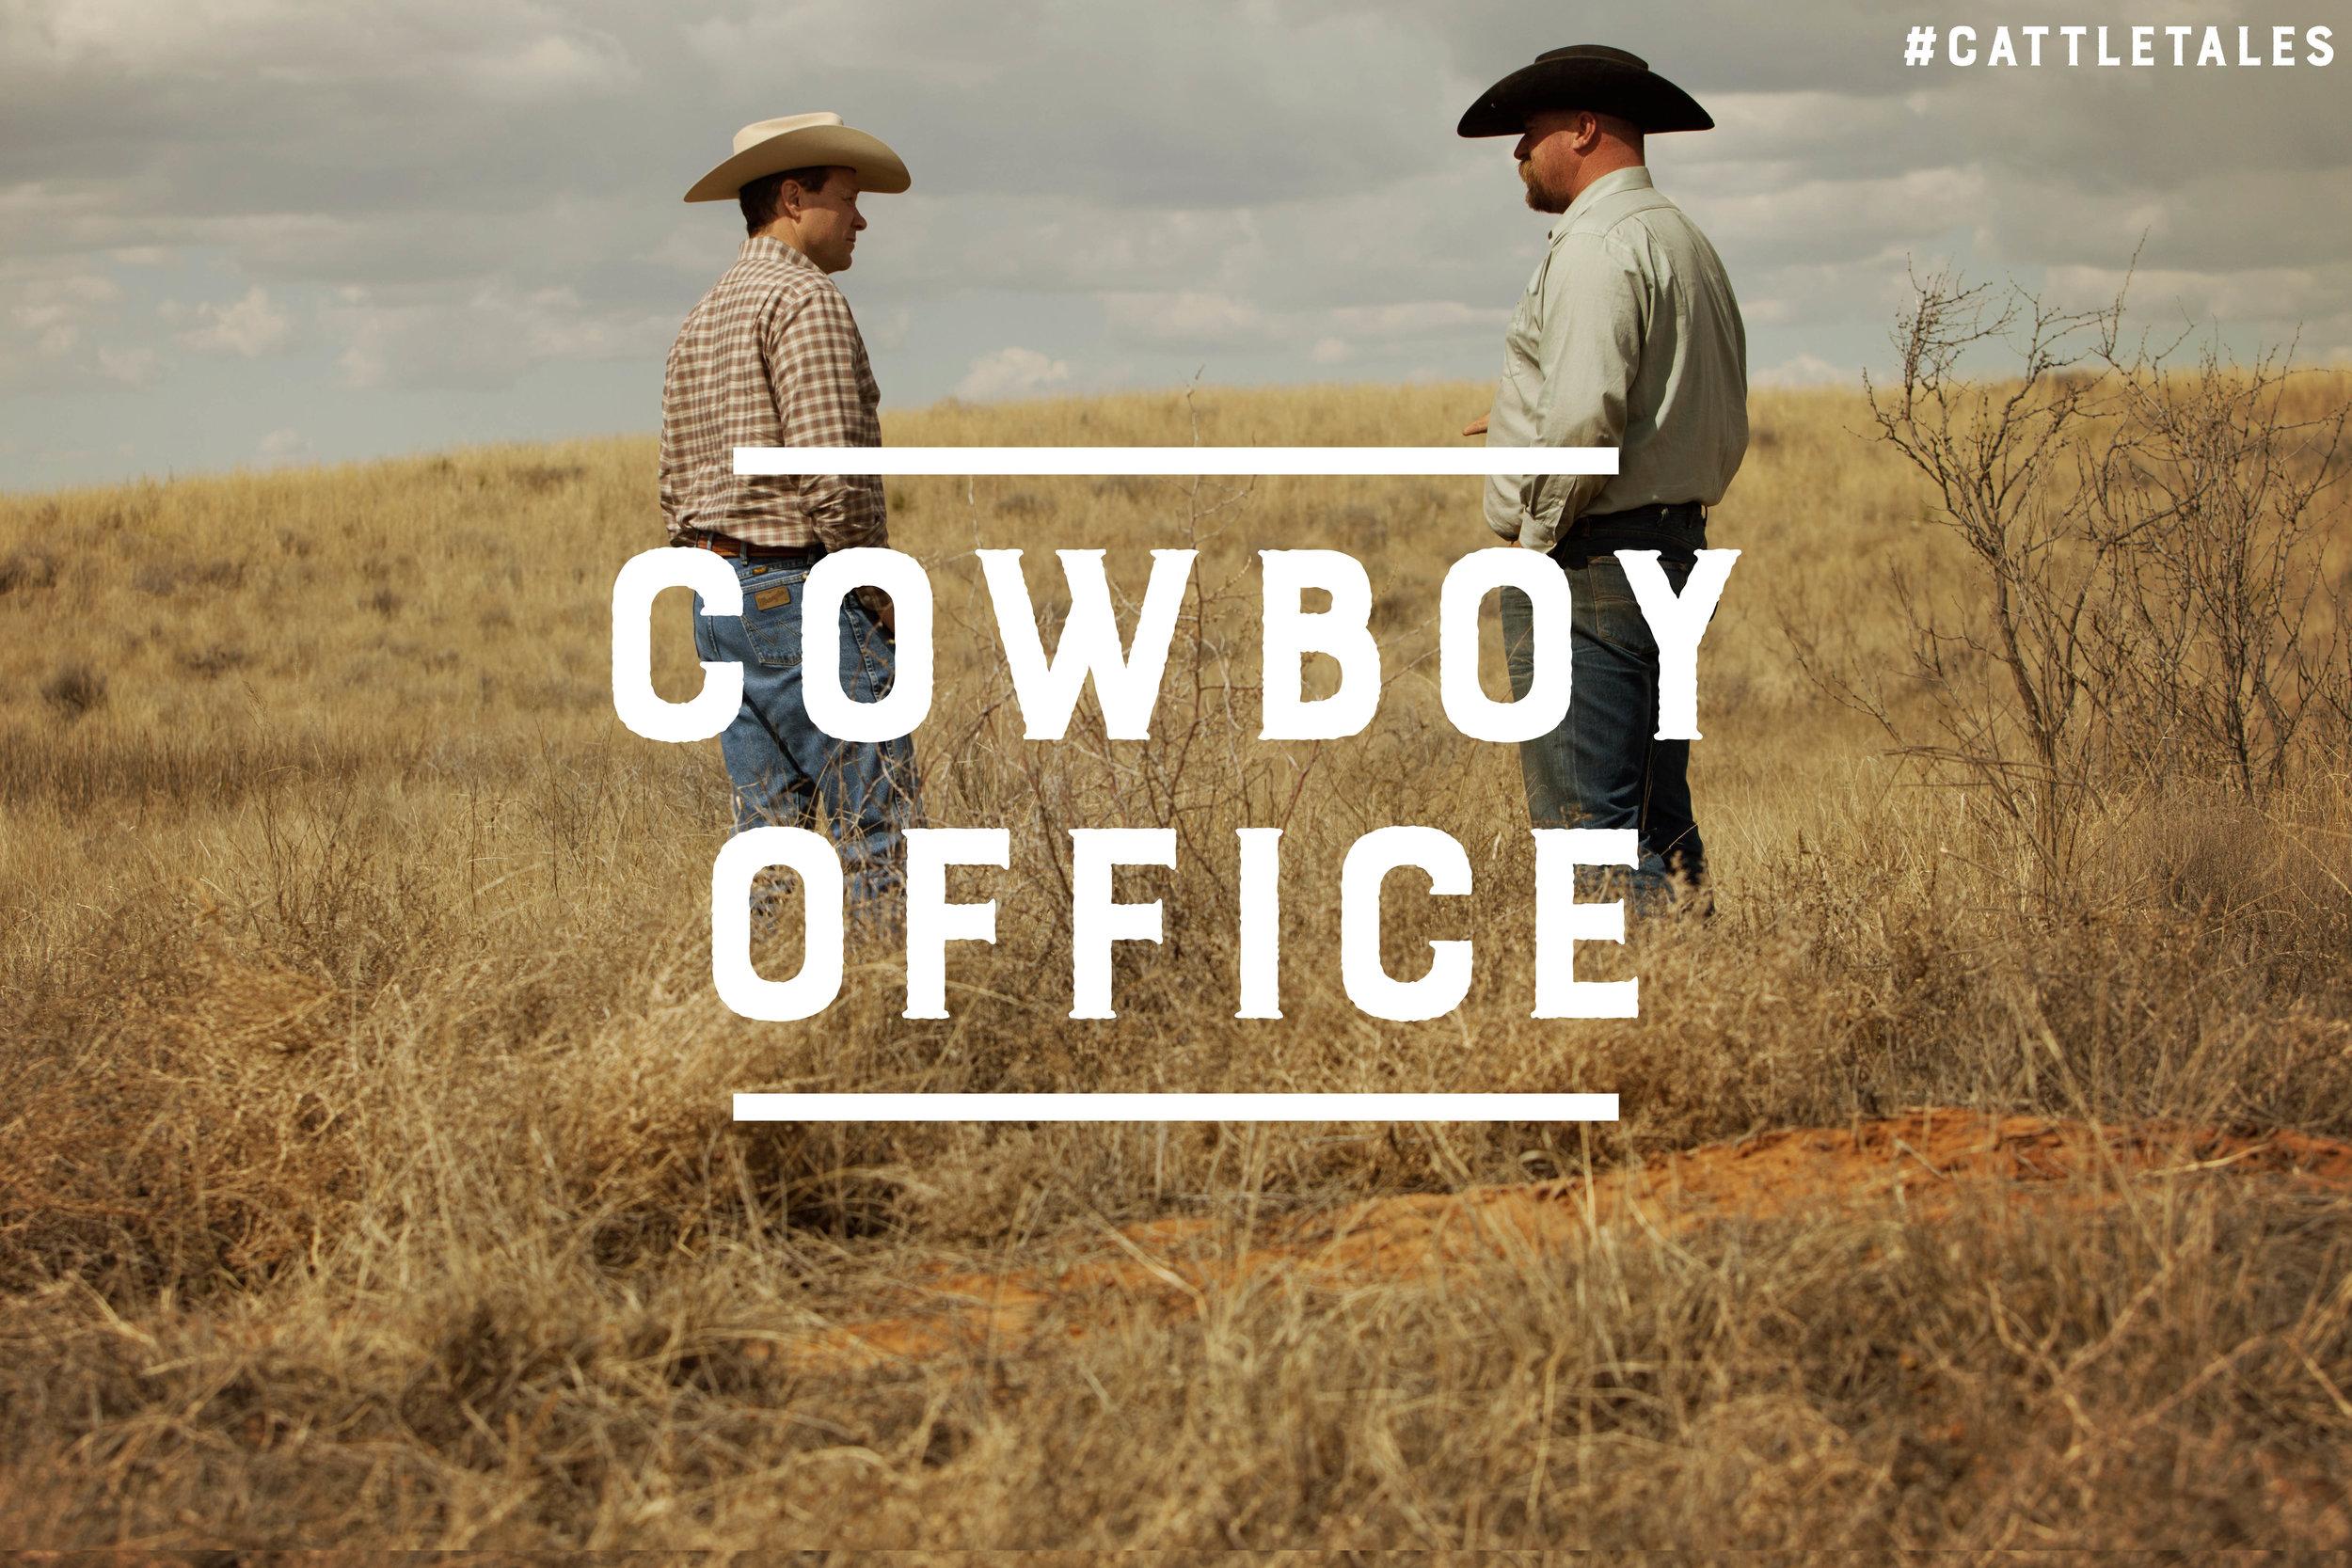 cowboy office.jpg